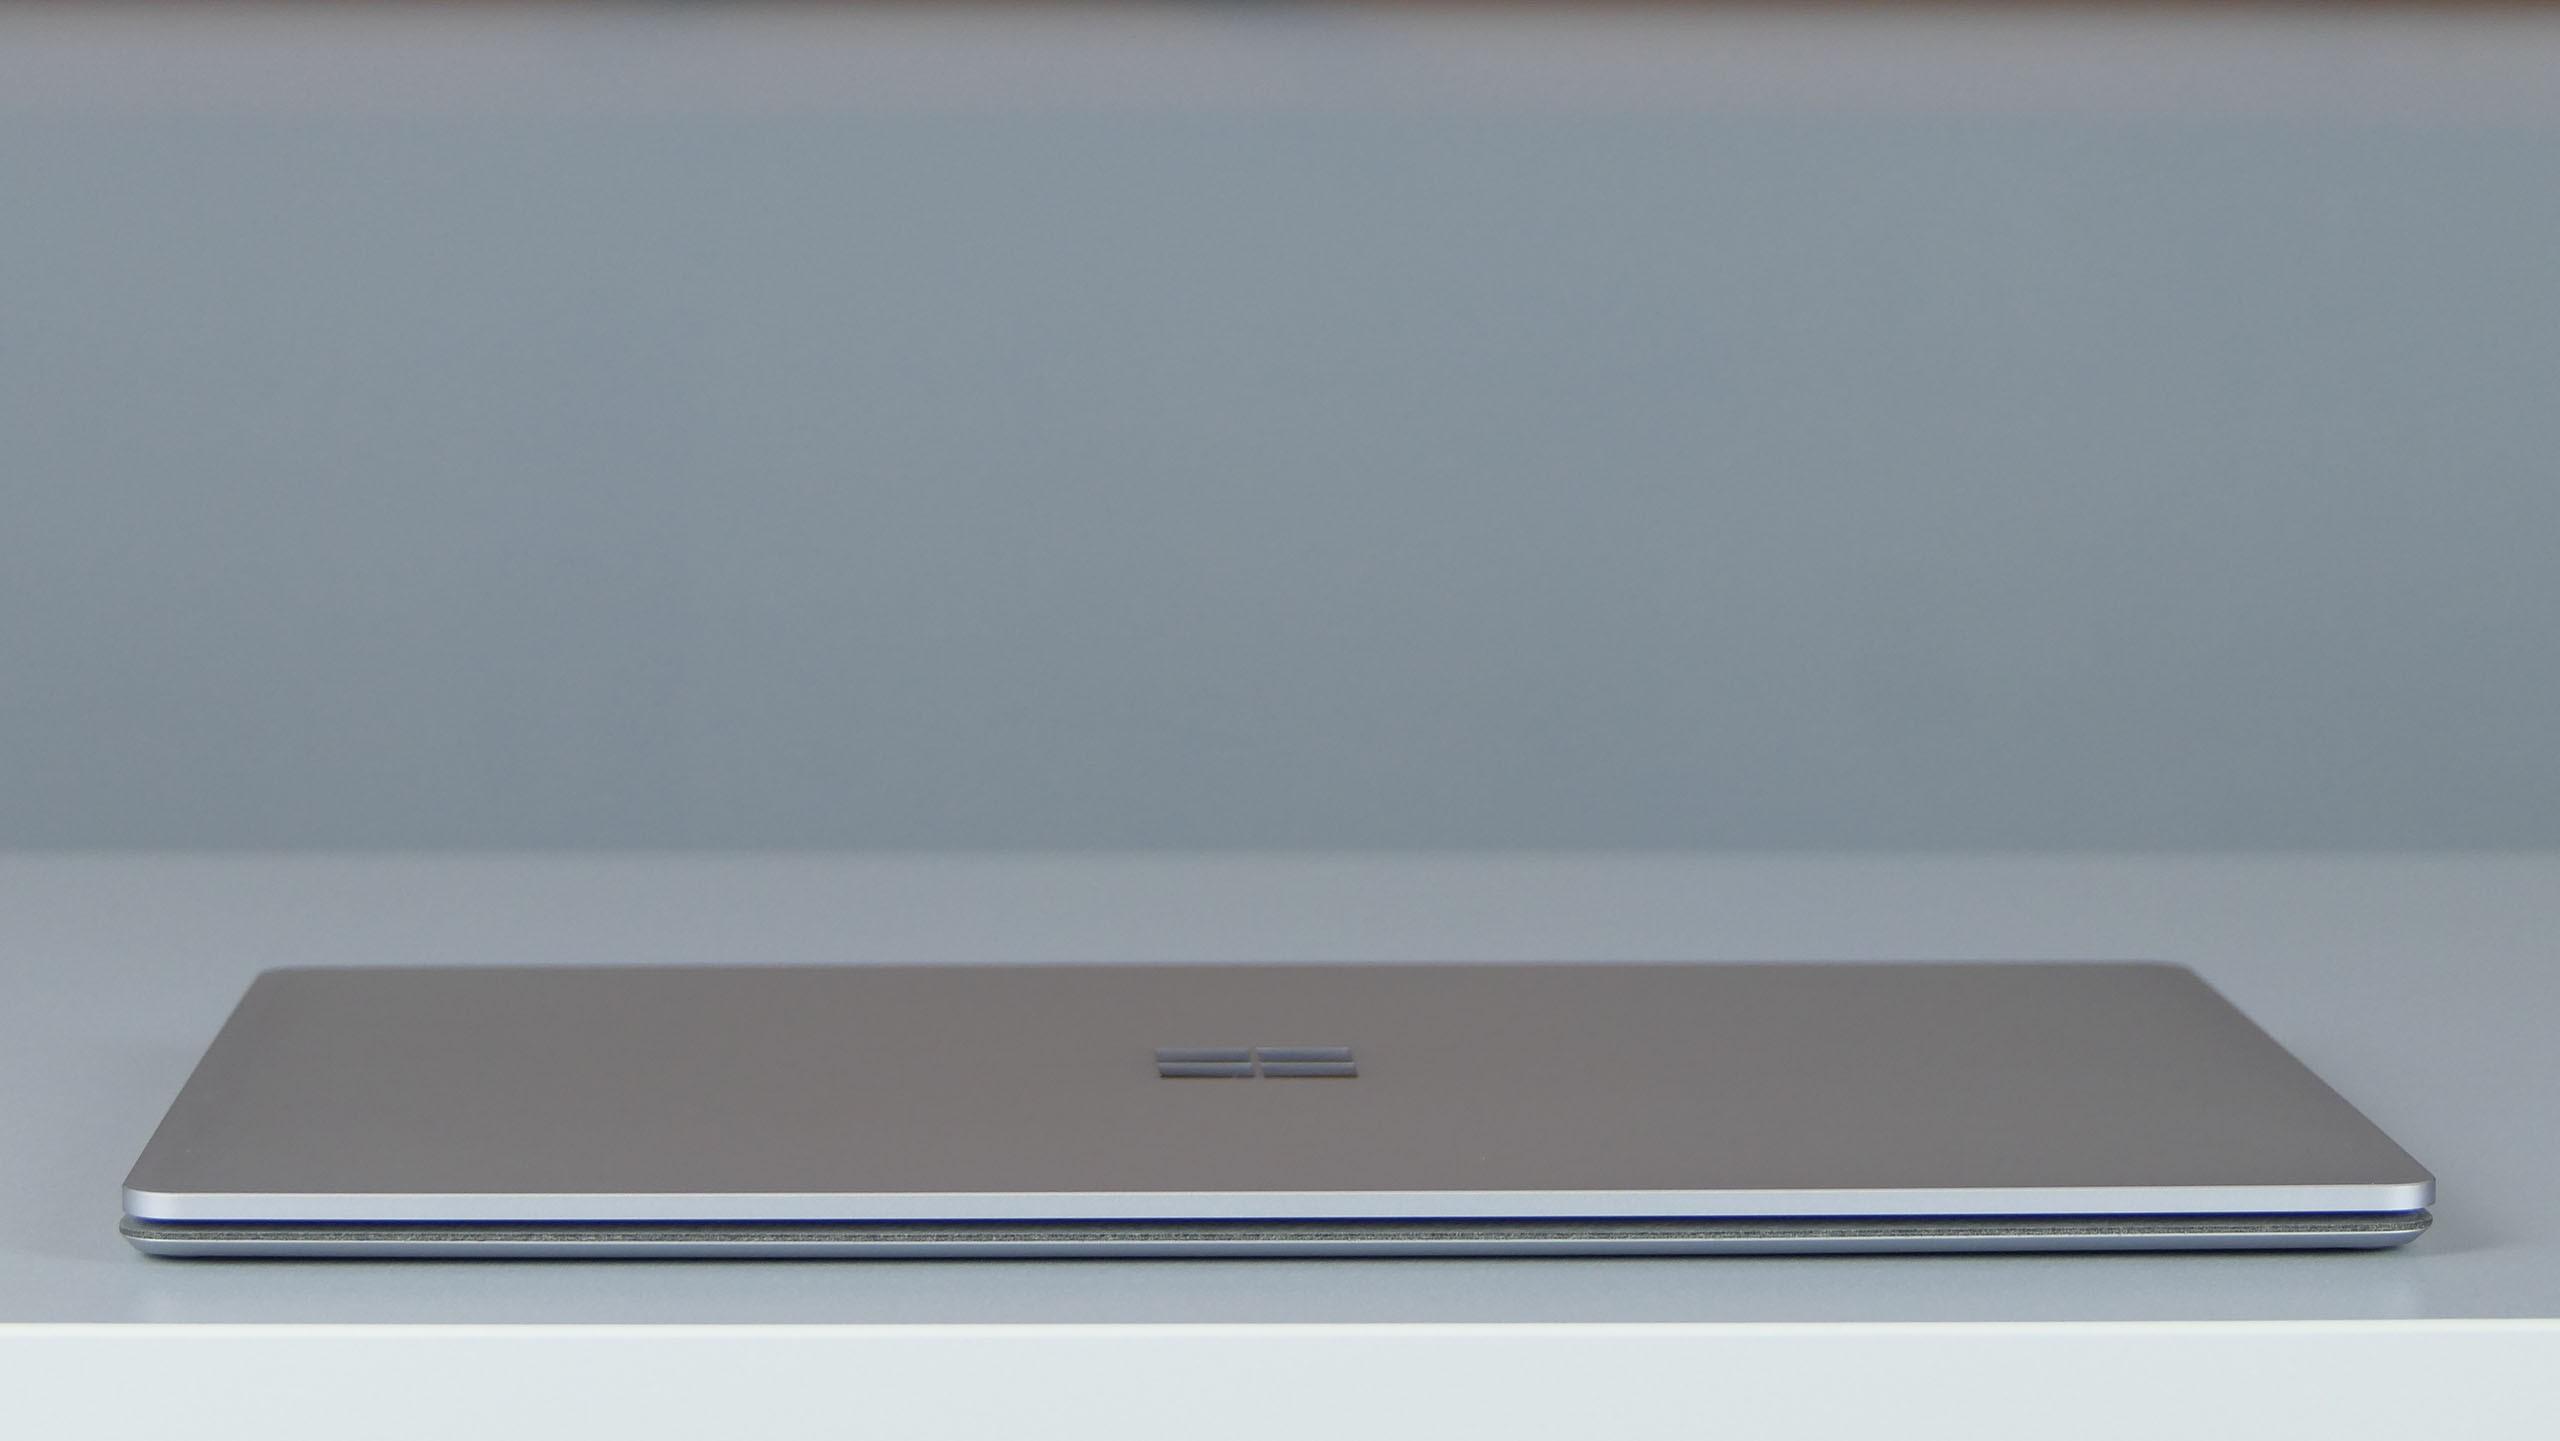 Microsoft Surface Laptop 2 - front ultrabooka